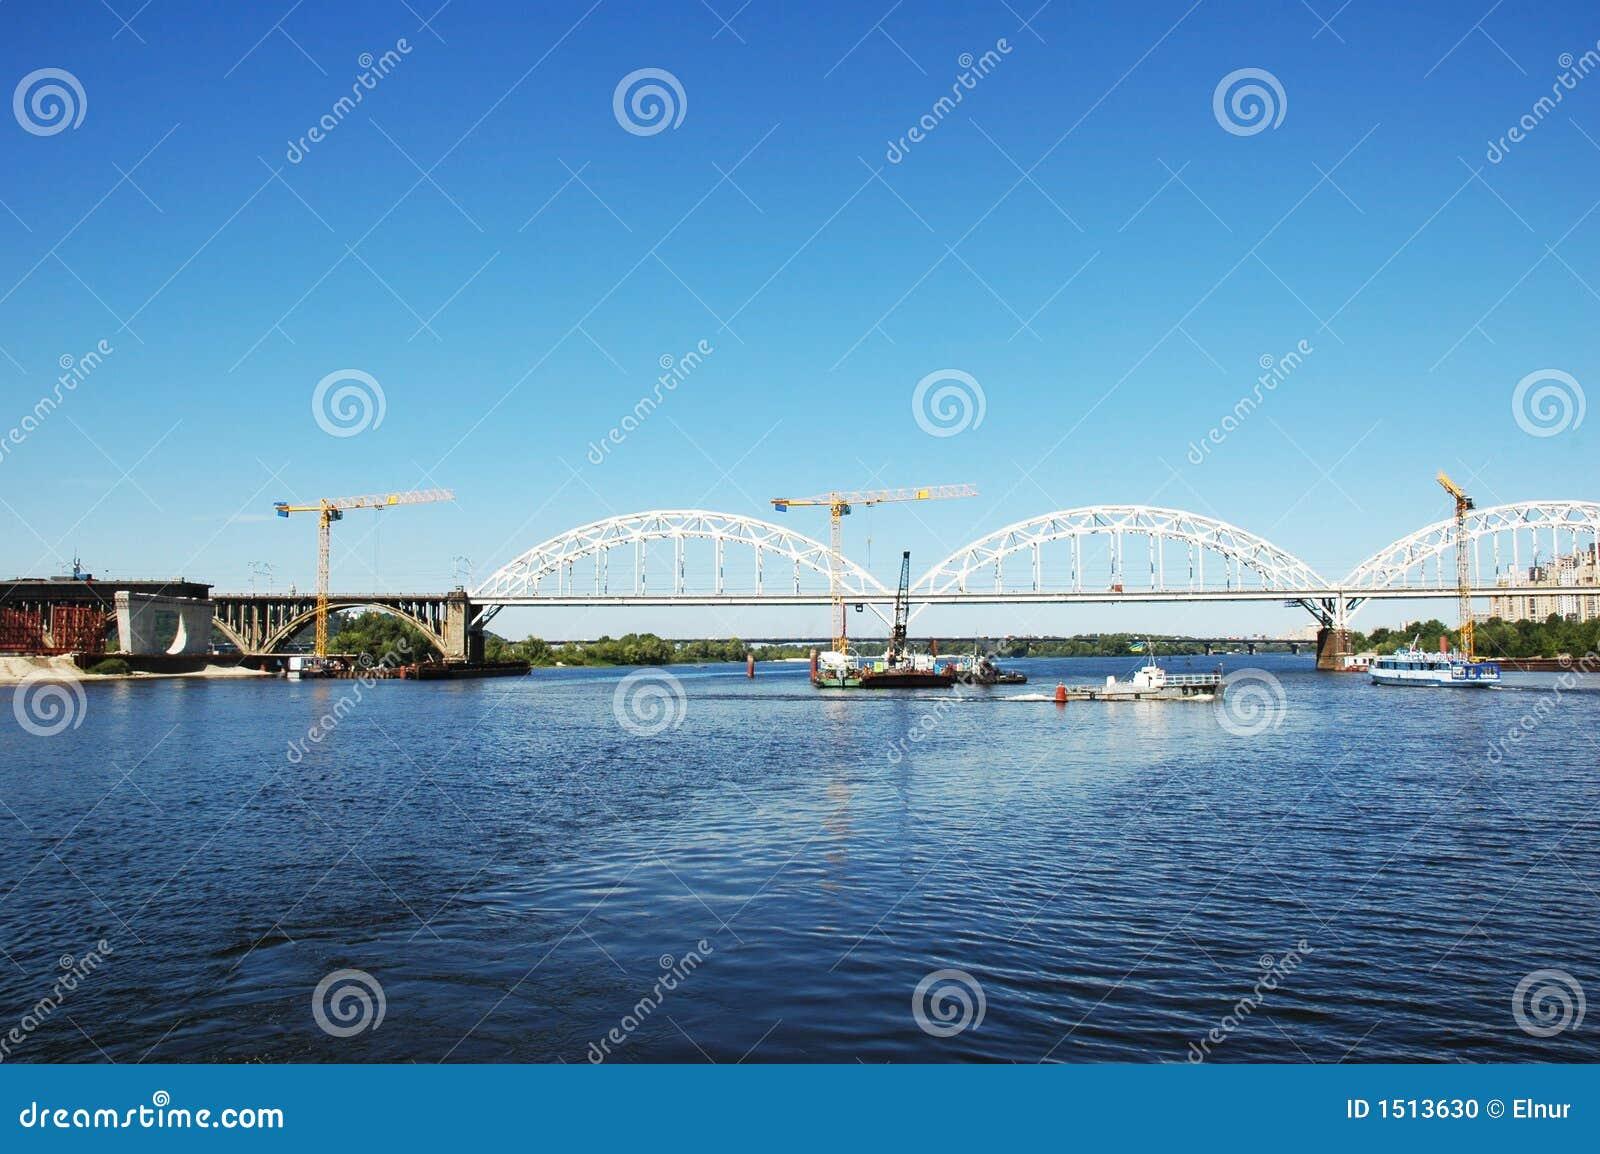 Cranes and bridge